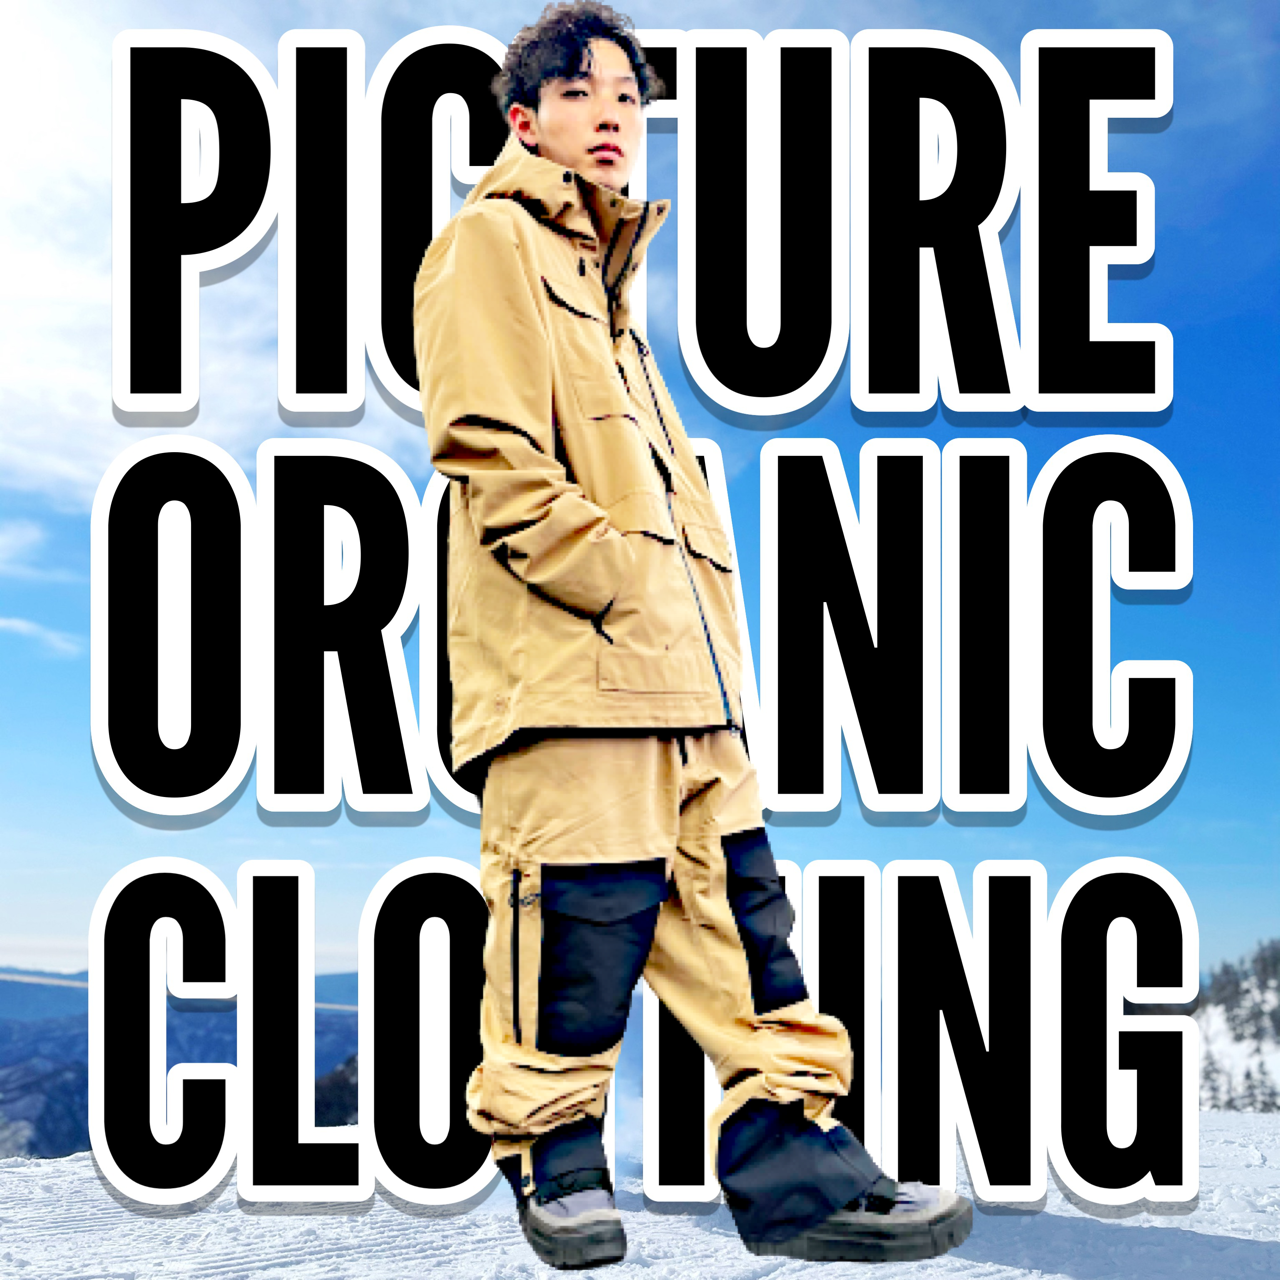 21-22 NEWモデルウェア PICTURE ORGANIC CLOTHING ピクチャー